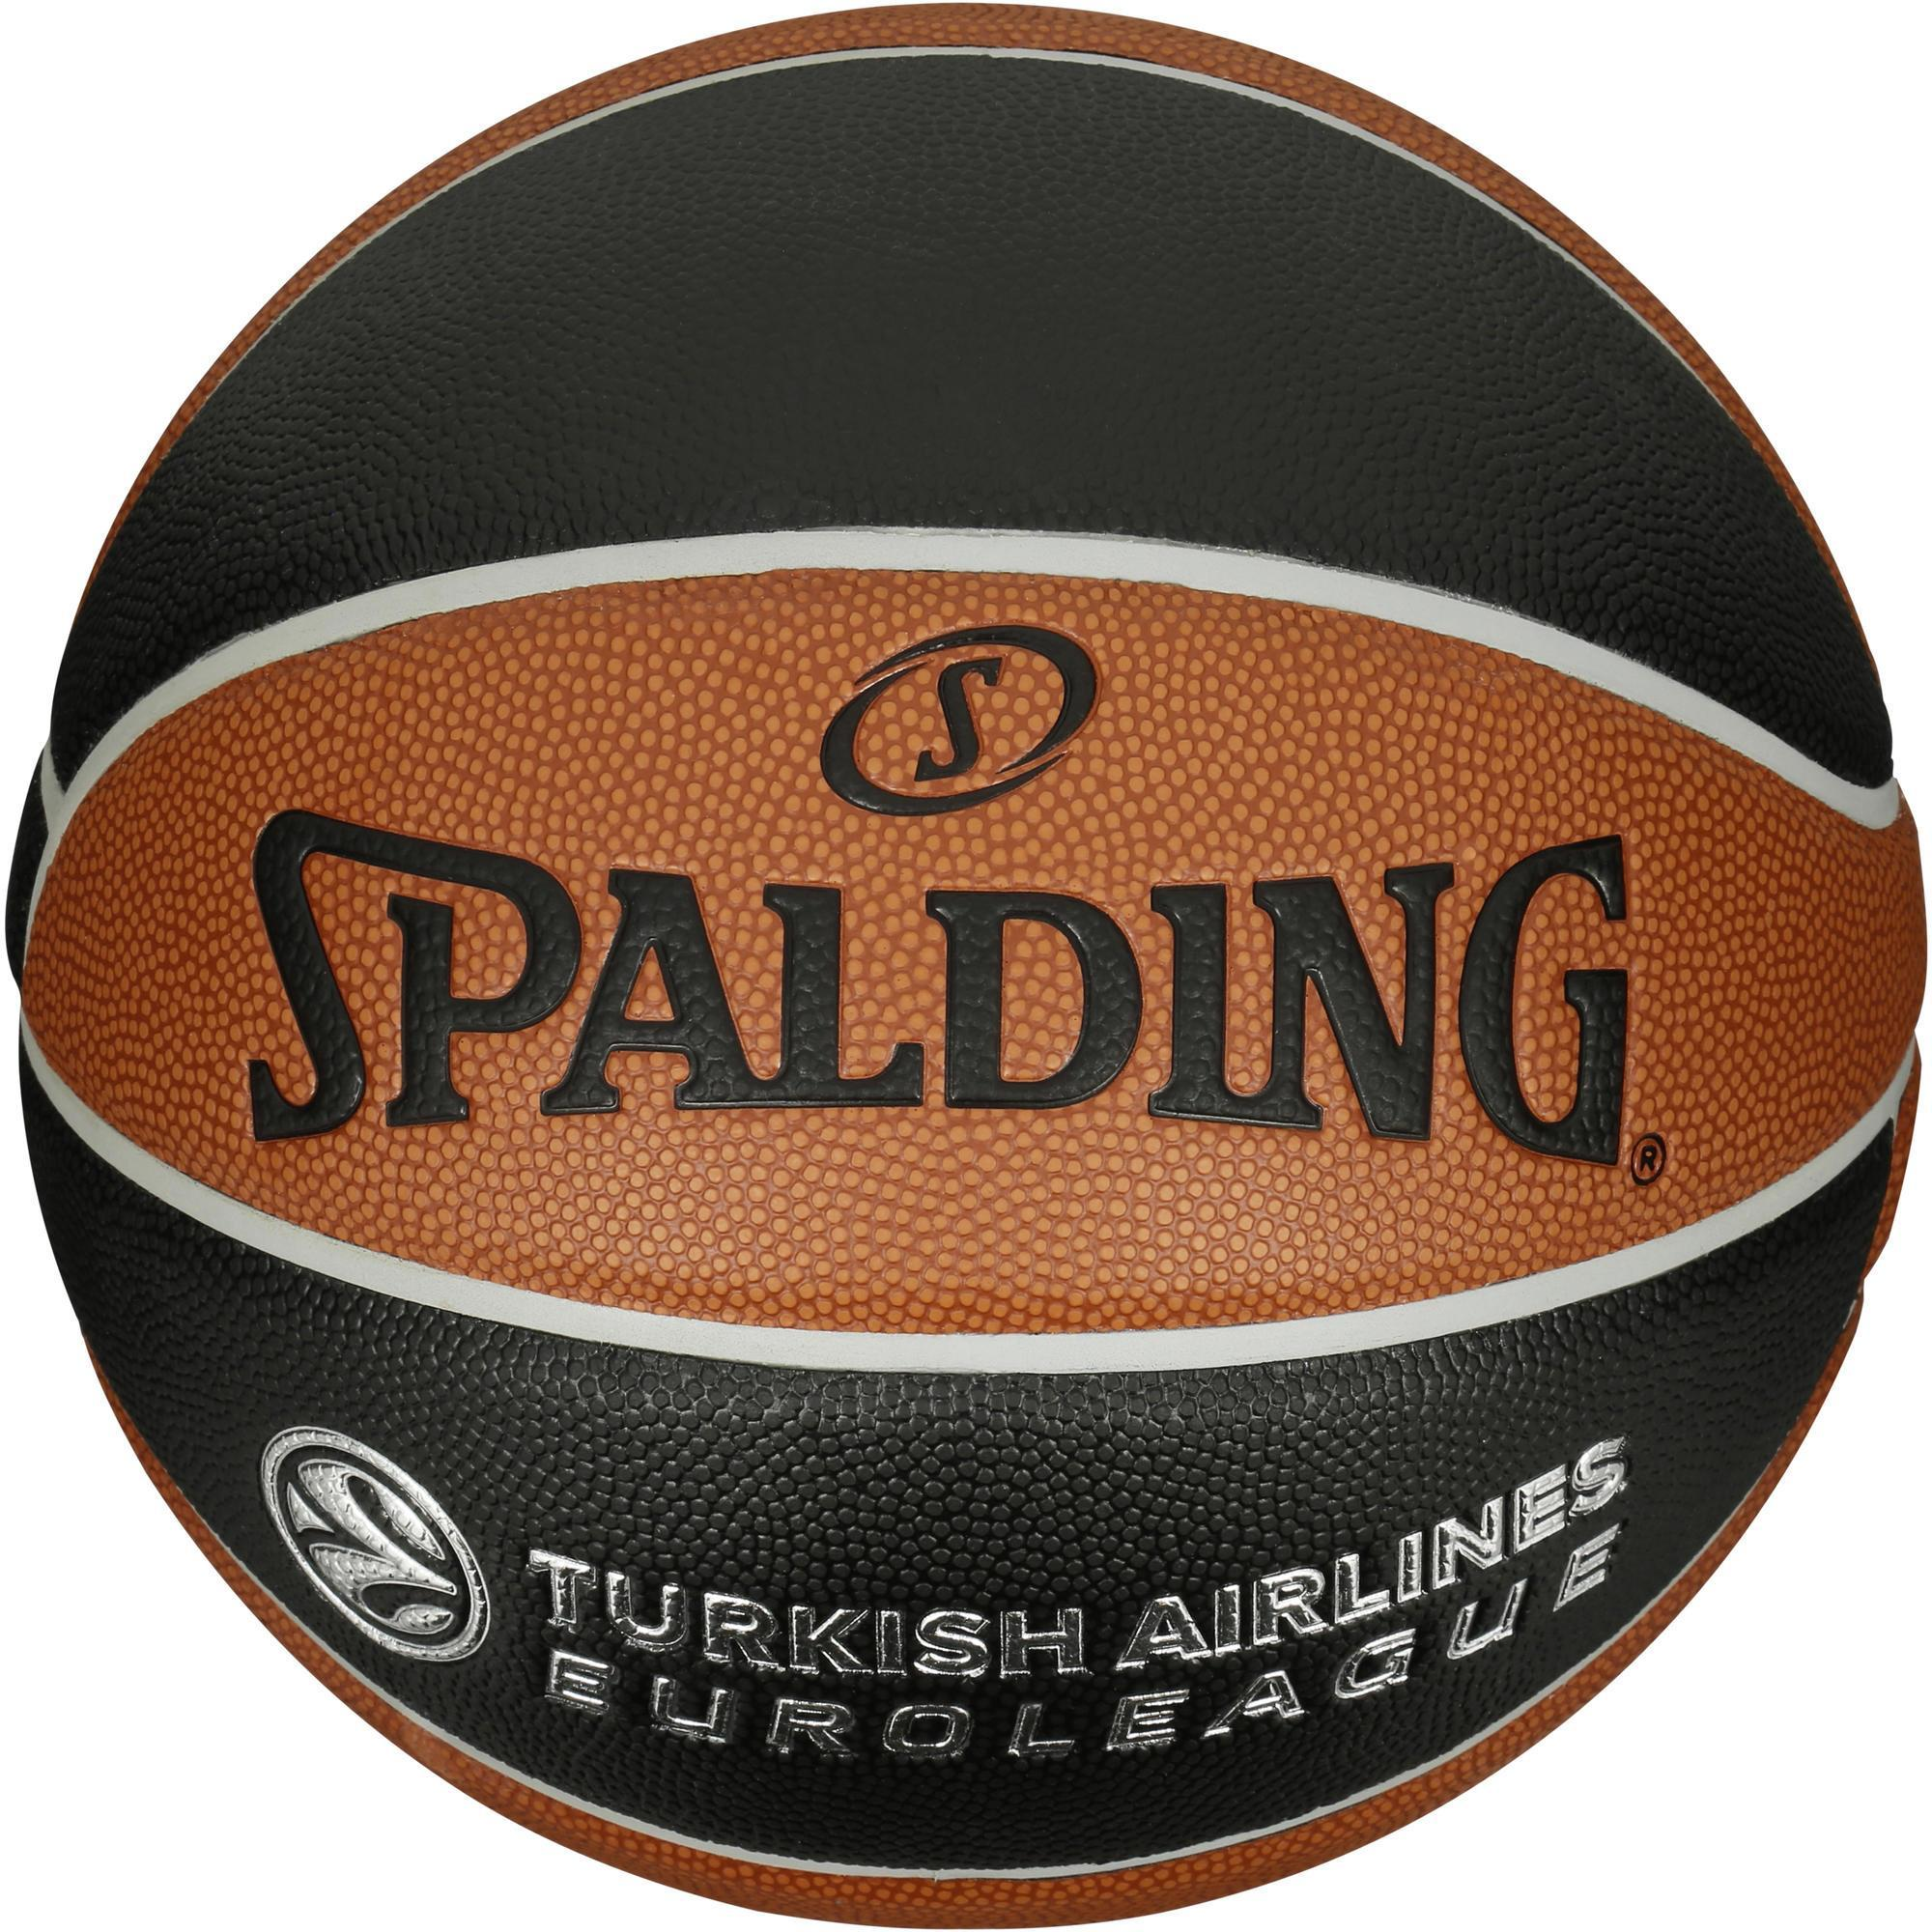 Basketbal TF 1000 EuroLeague maat 7